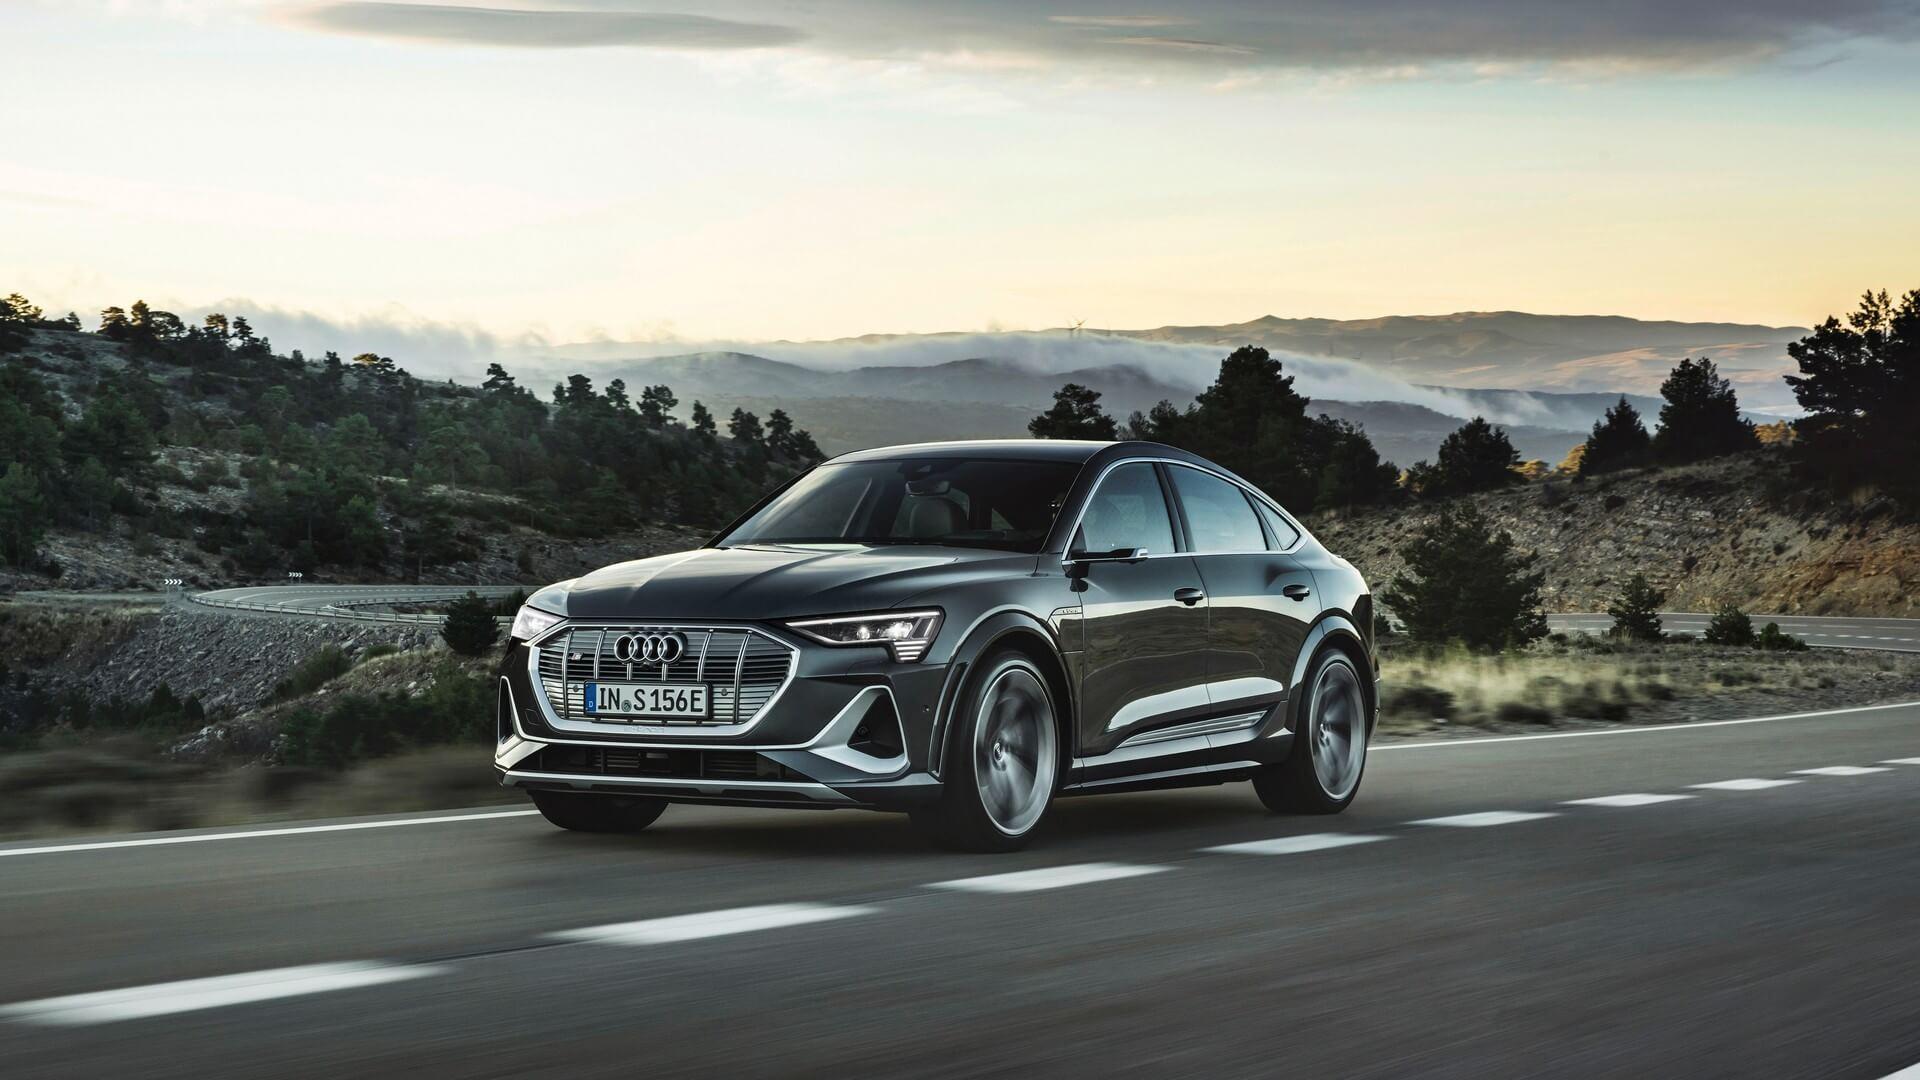 Audi-E-Tron-S-and-E-Tron-S-Sportback-2020-46